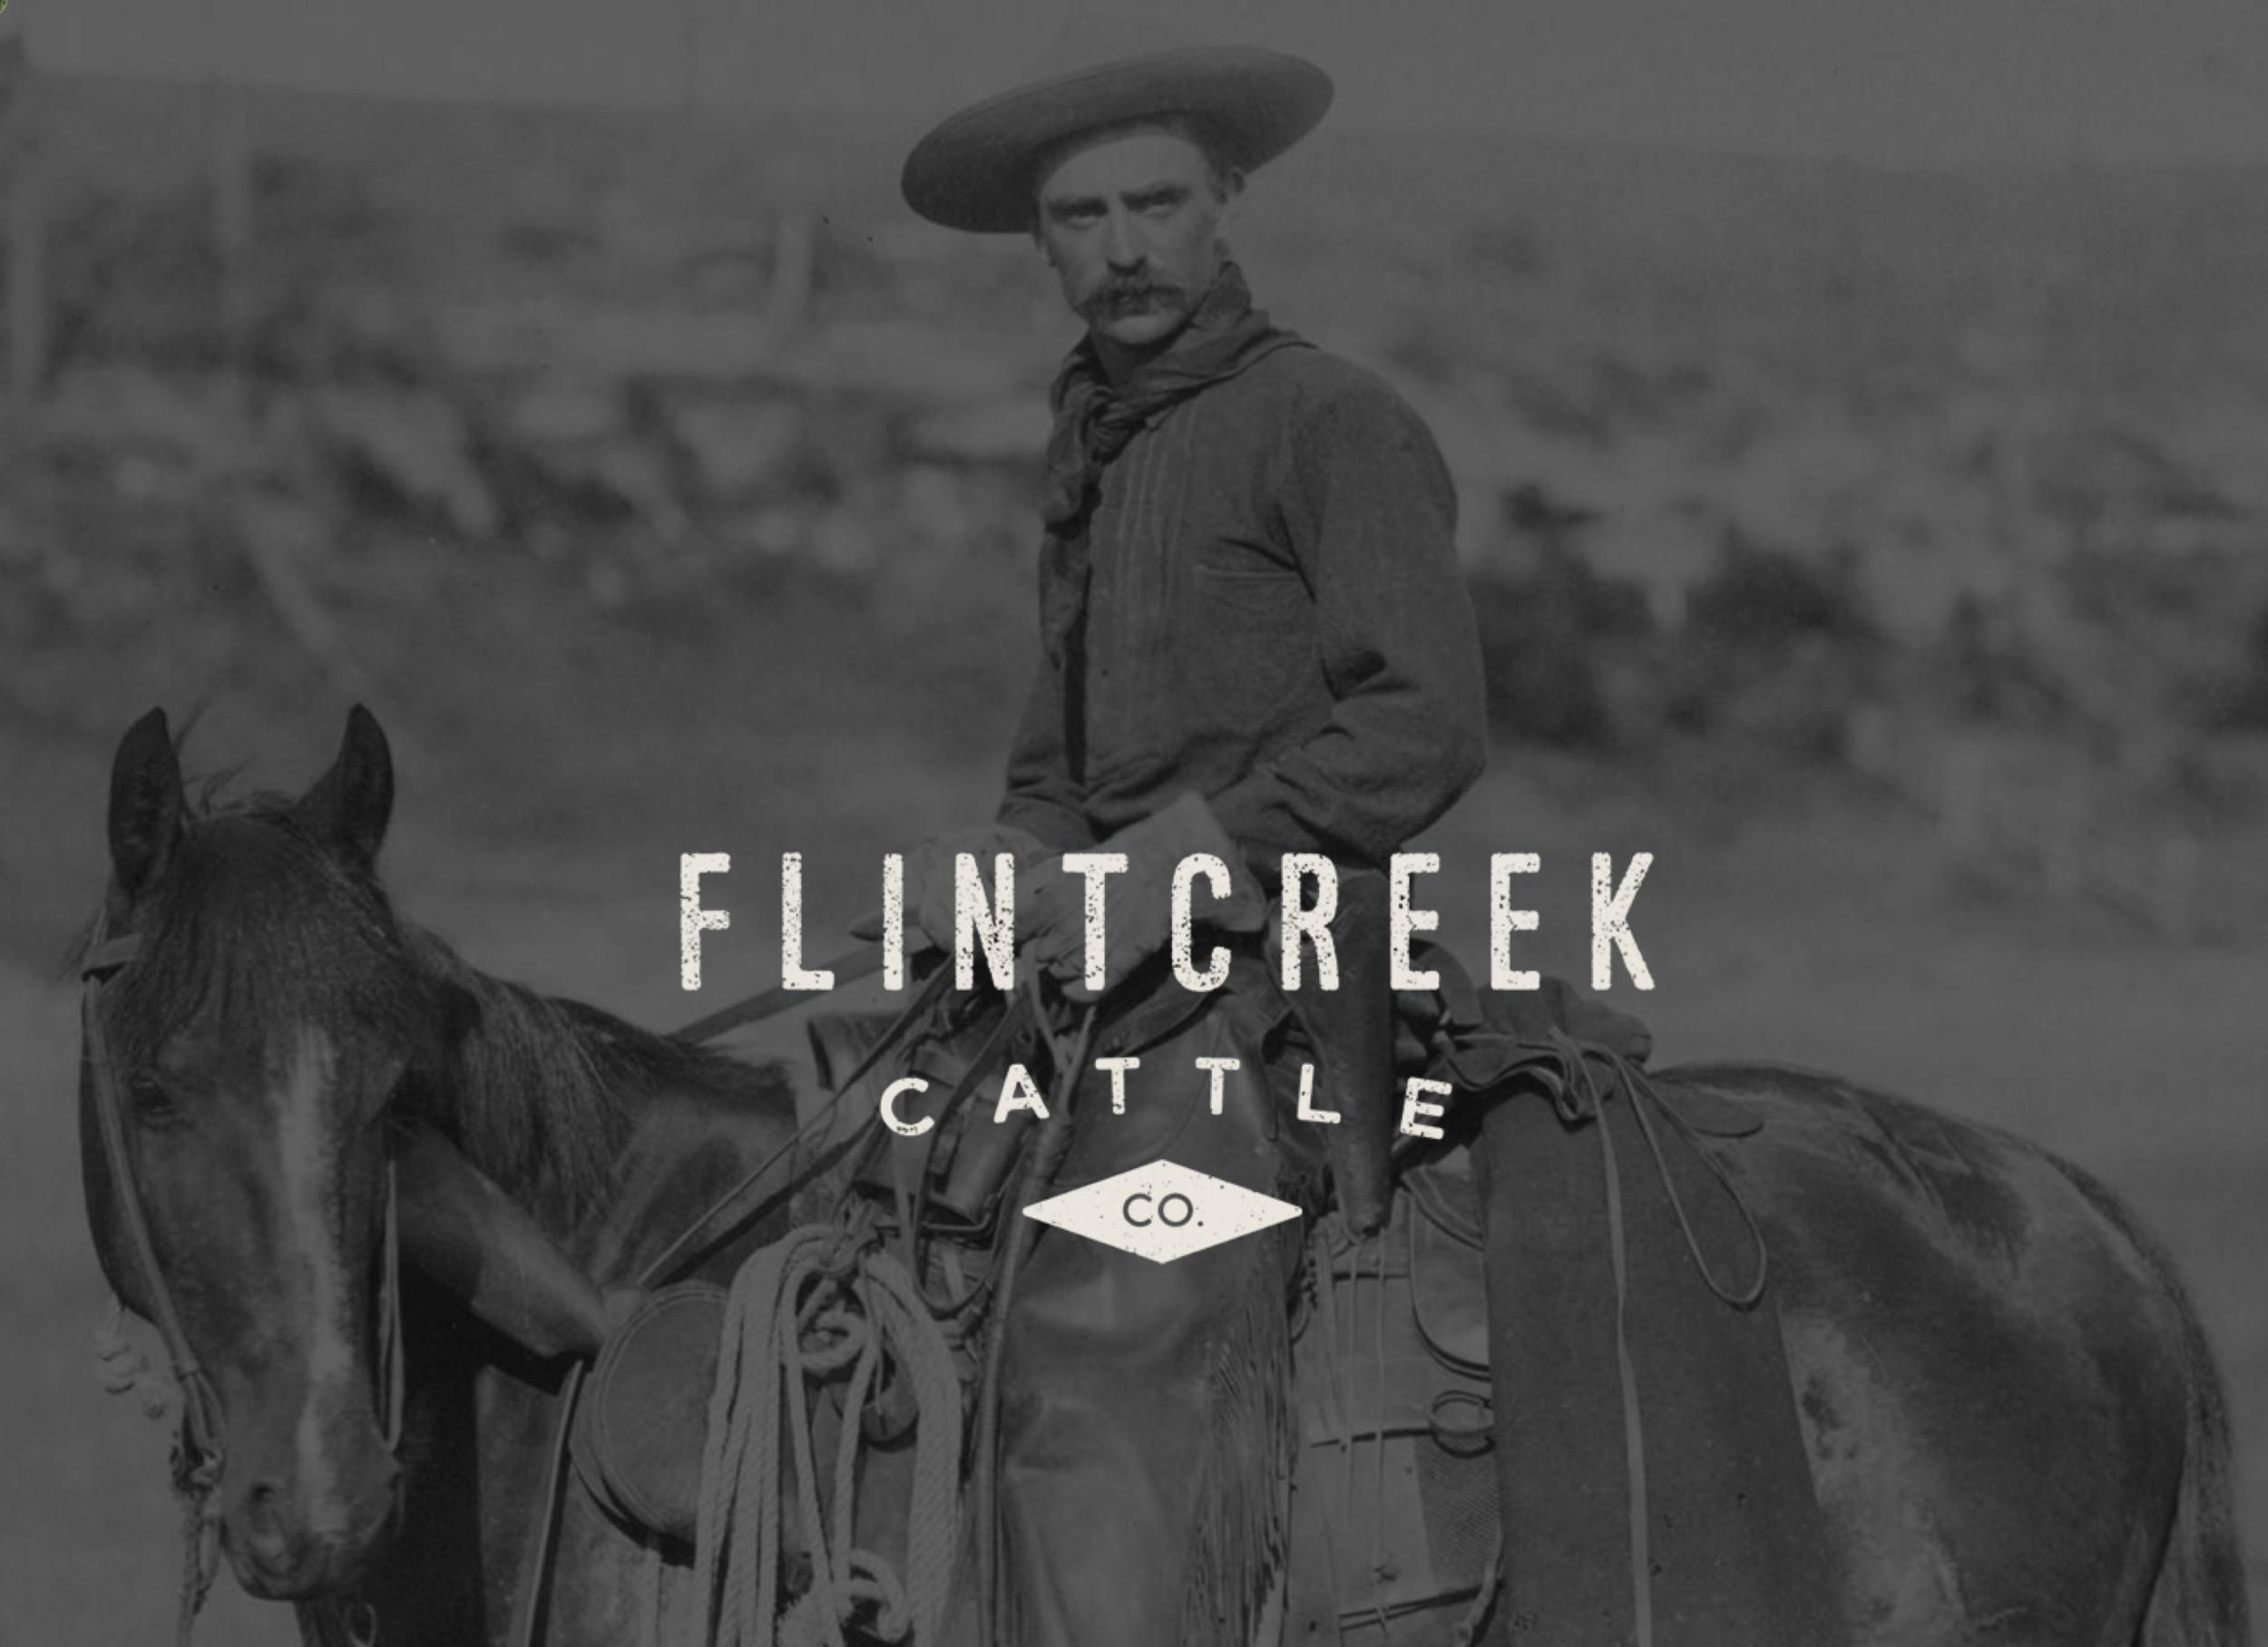 Flint Creek Cattle Company